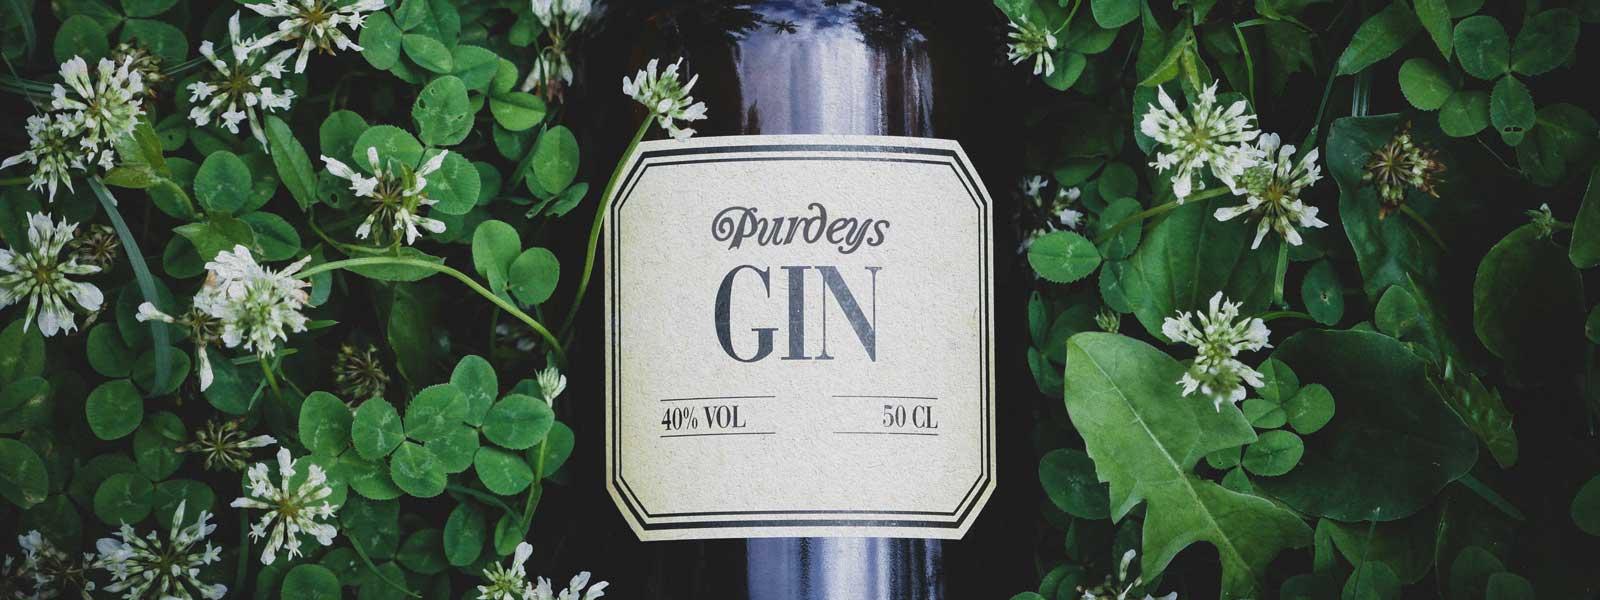 gin label printing uk